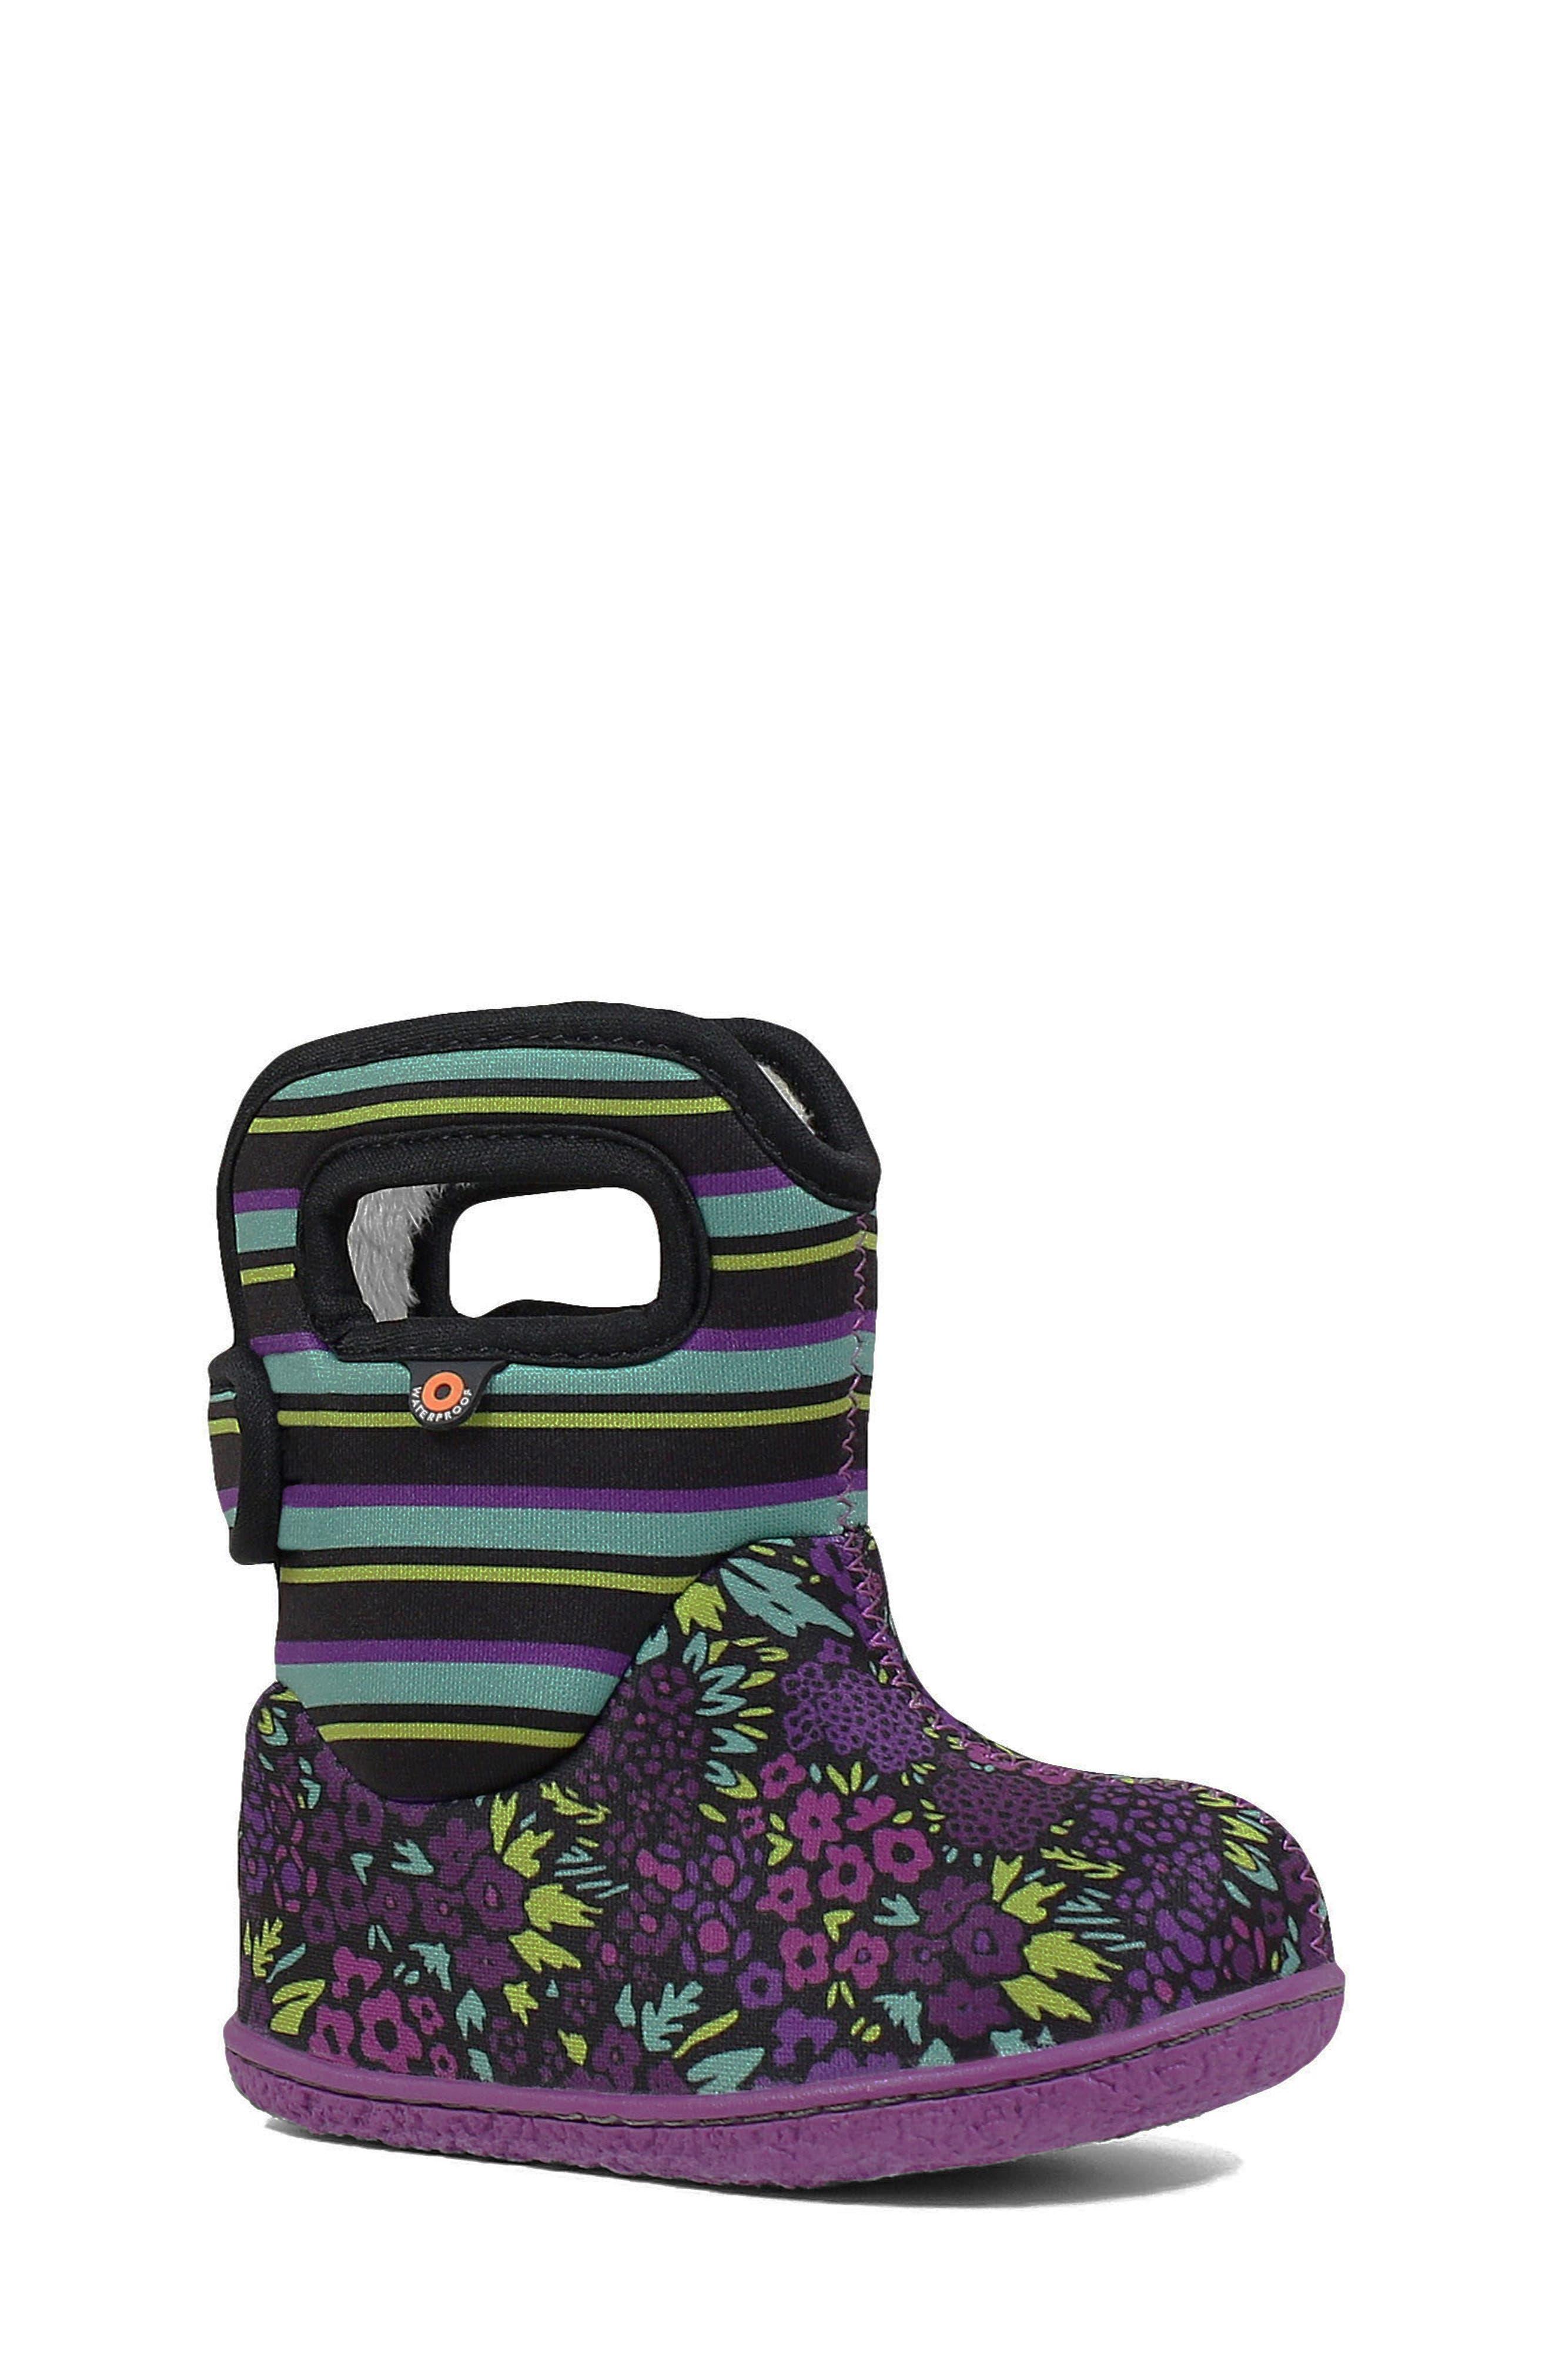 Bogs Toddler Girl's Bogs Baby Bogs Garden Insulated Waterproof Boot, Size 7 M - Black